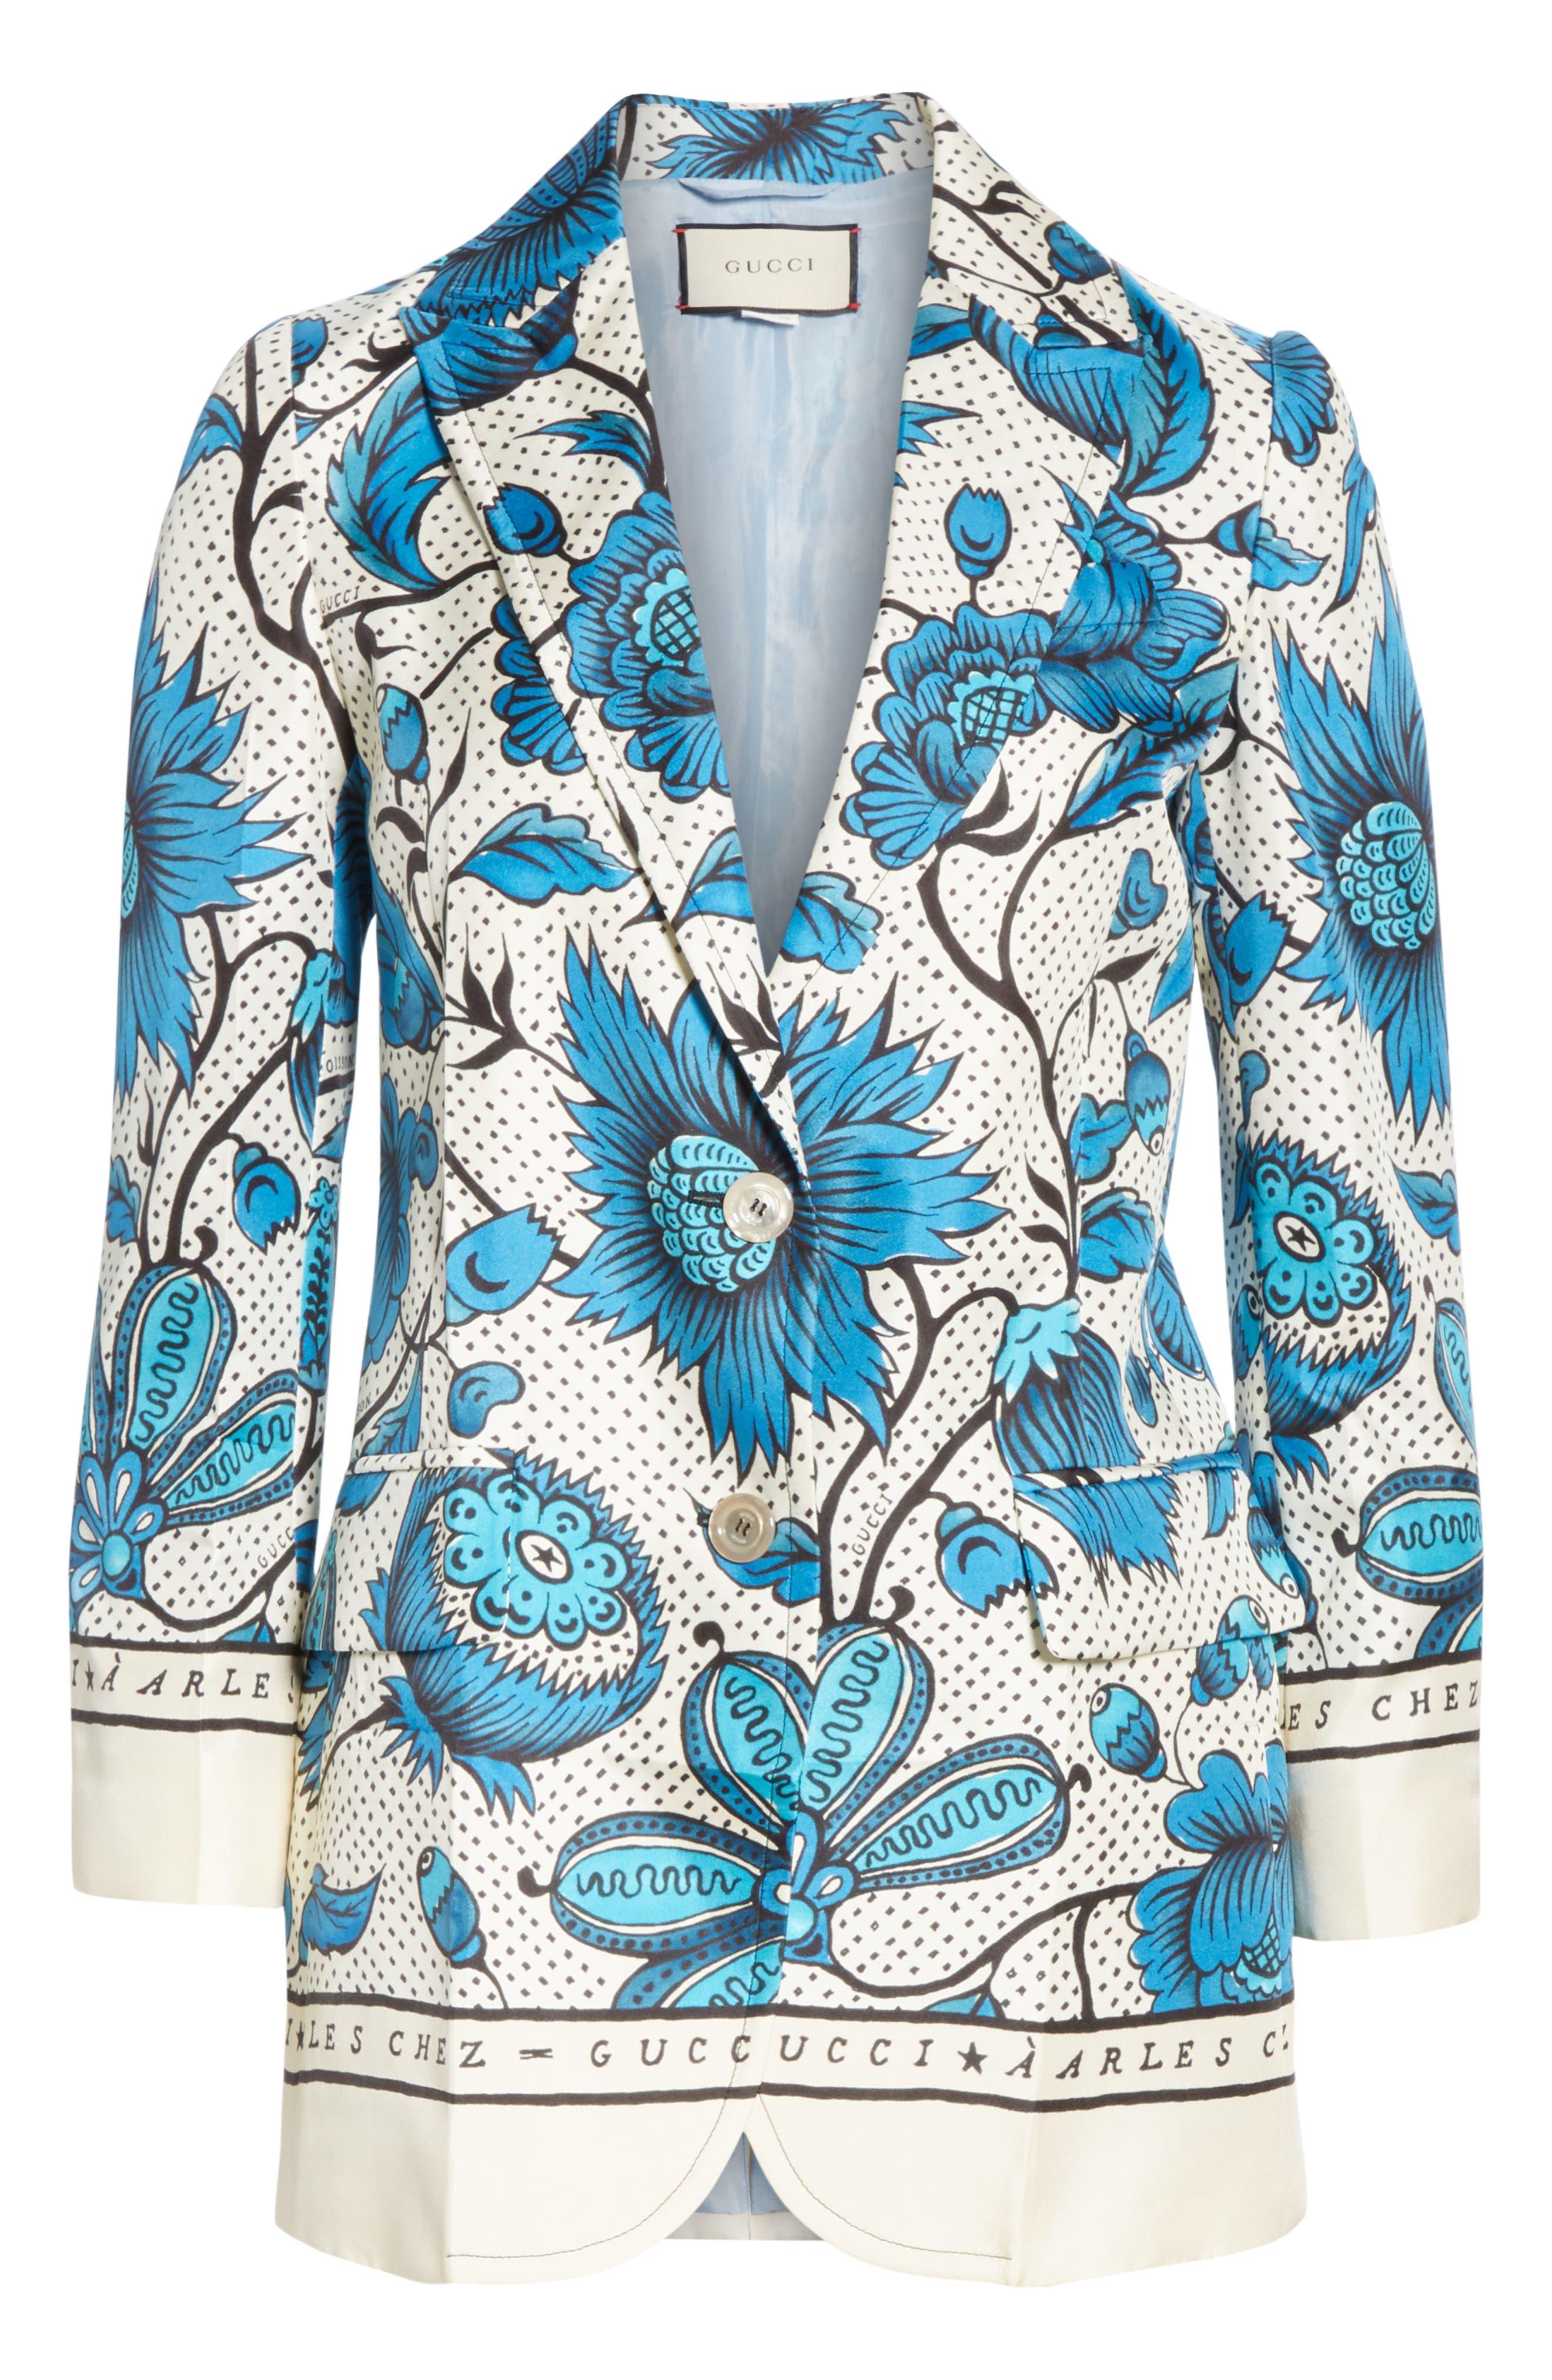 Watercolor Floral Print Silk Jacket,                             Alternate thumbnail 3, color,                             4821 BLUE/ IVORY PRT/ MC